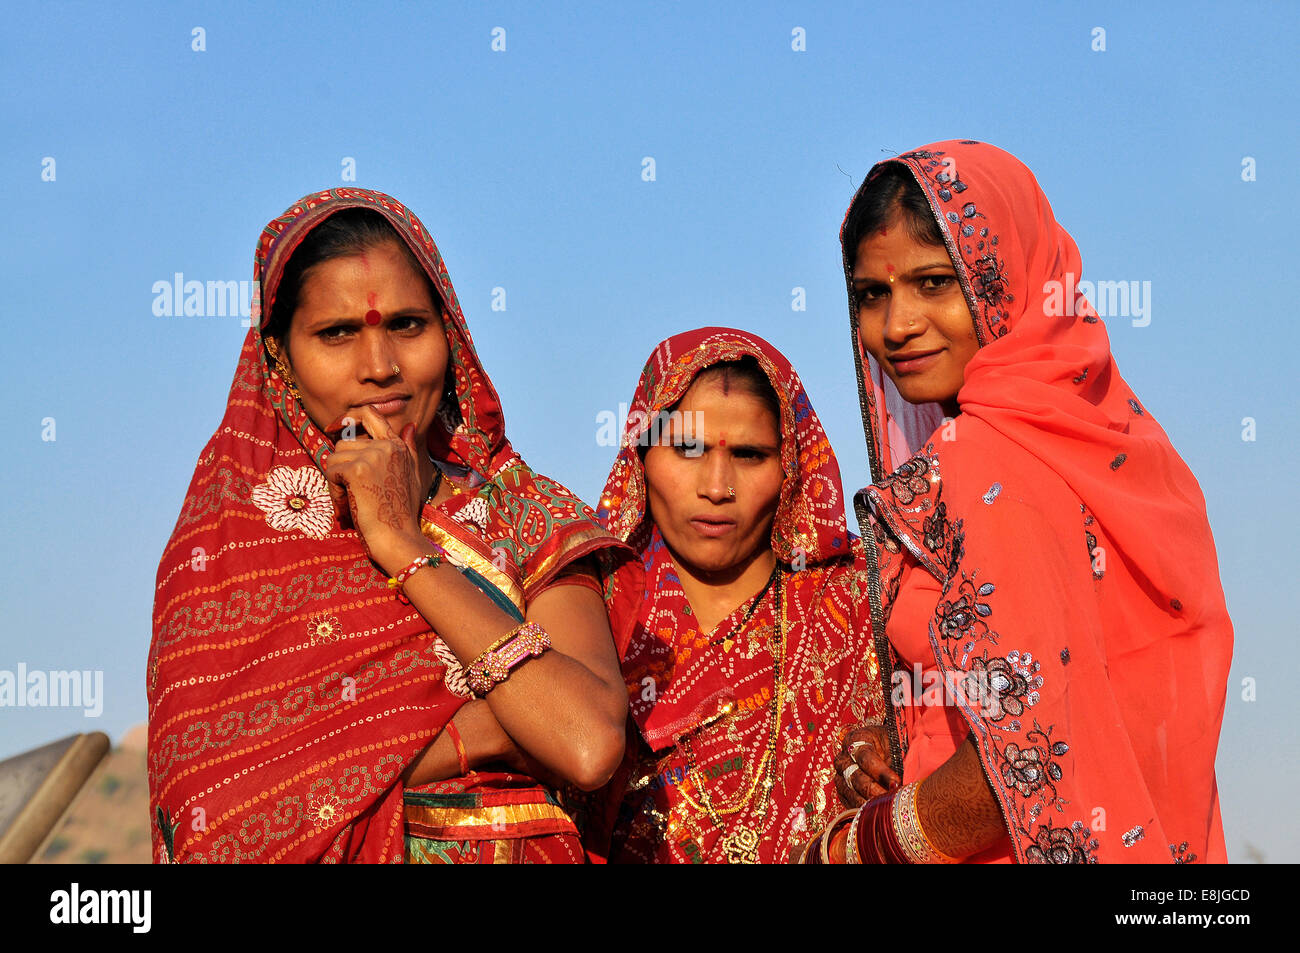 Le donne di Rajasthani. Immagini Stock